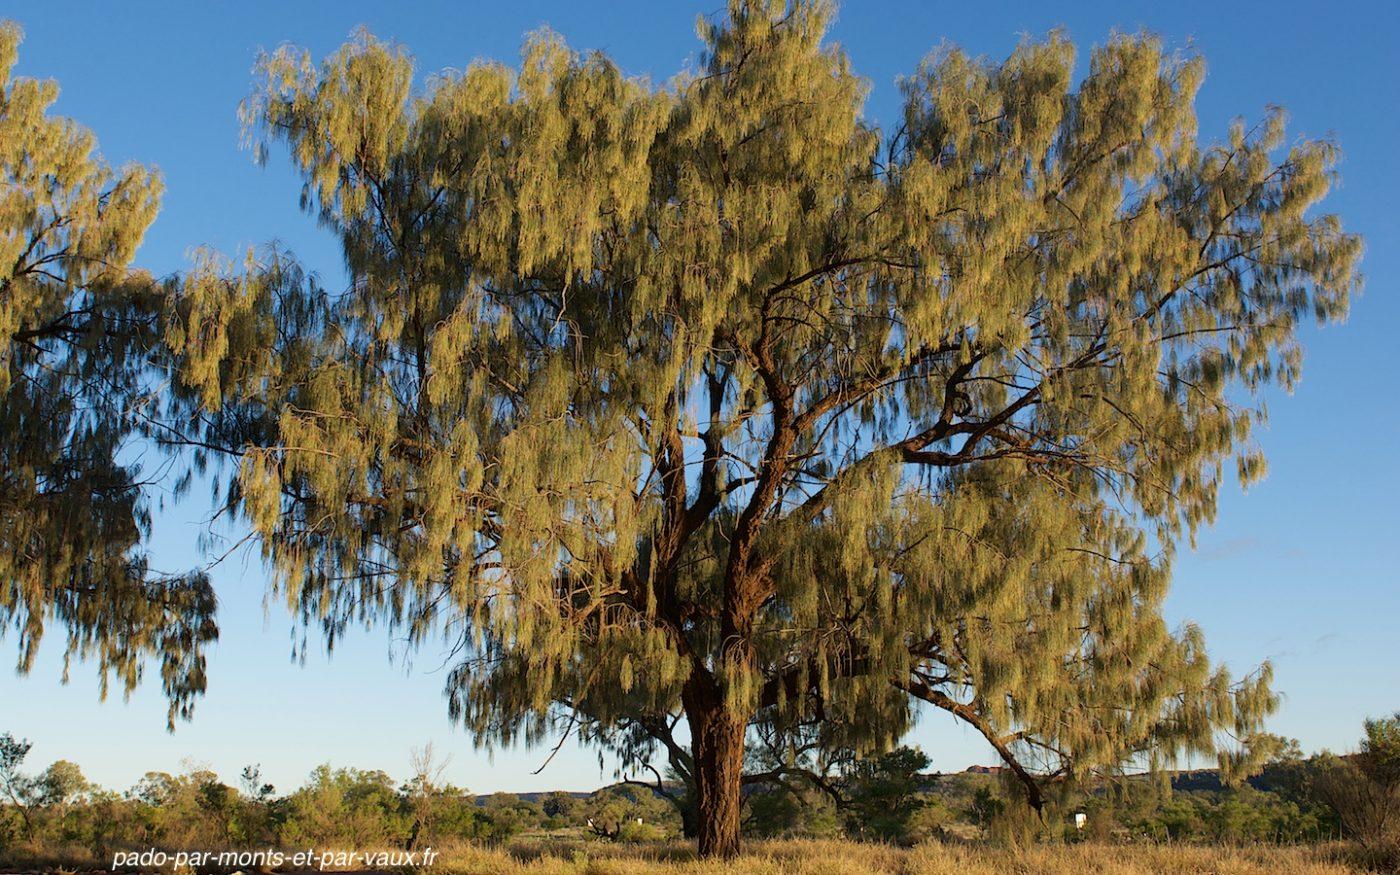 Kings creek station - desert oak